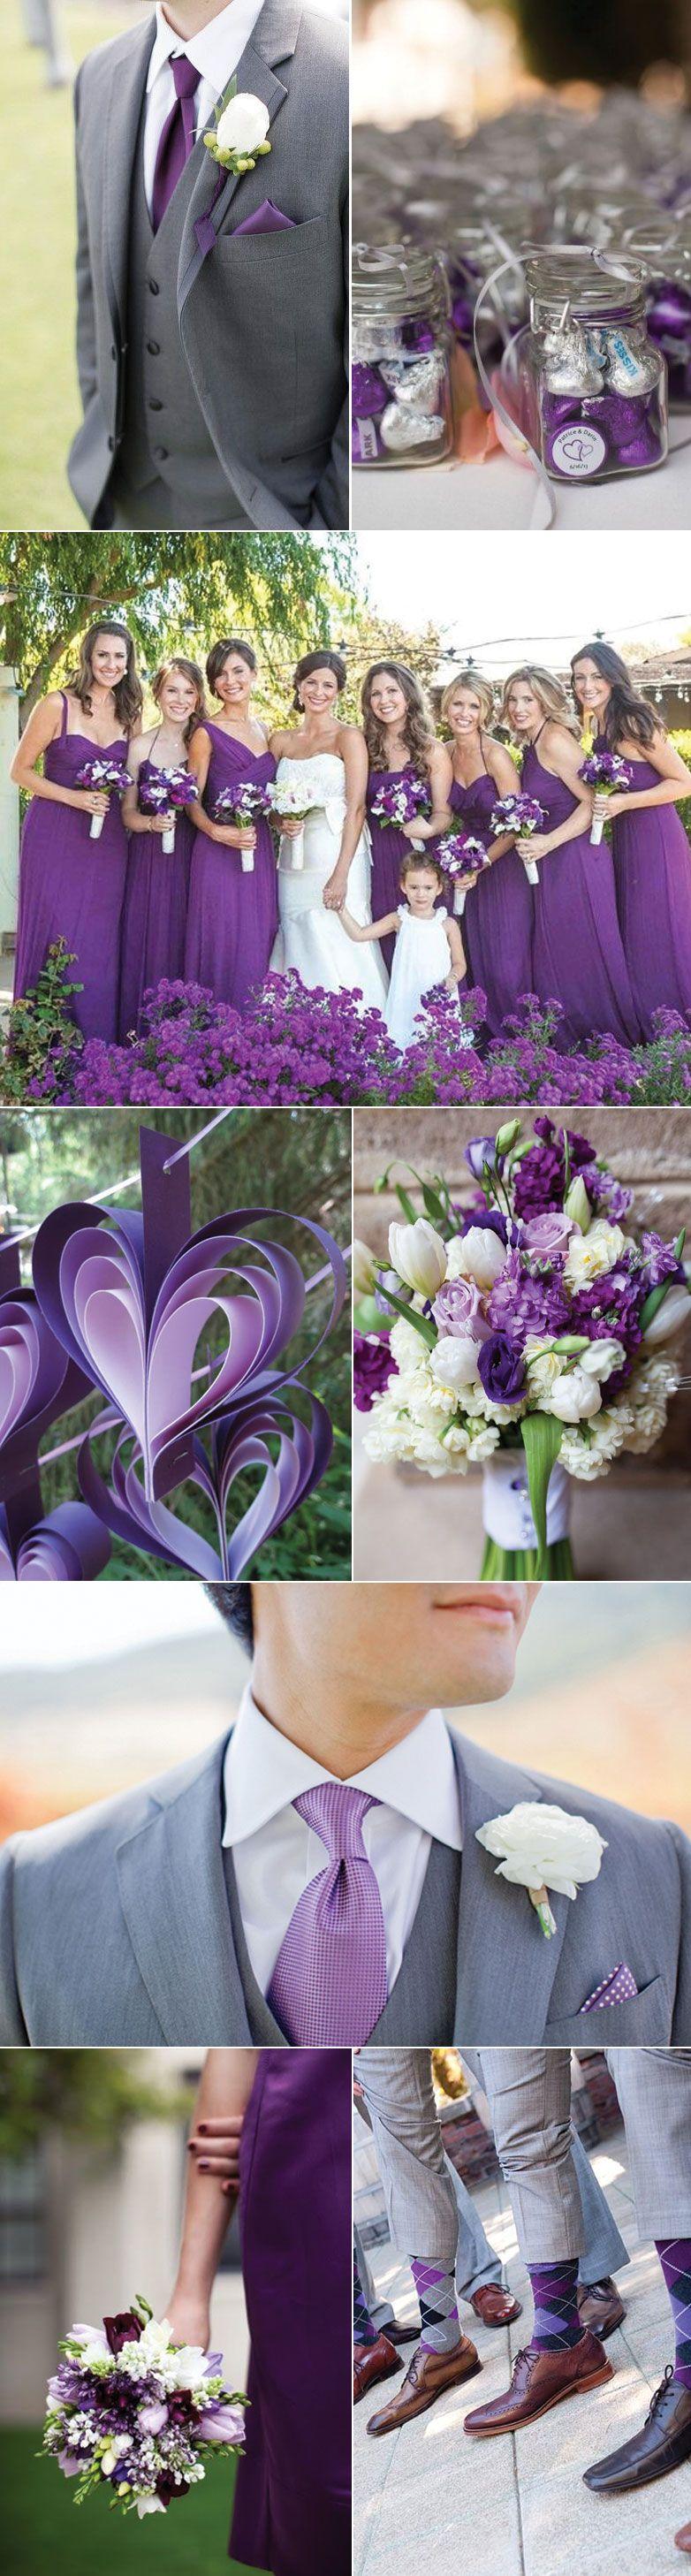 Mulberry Wedding | Ideas and Visual Inspiration | Bodita Sandy/Chuwi ...